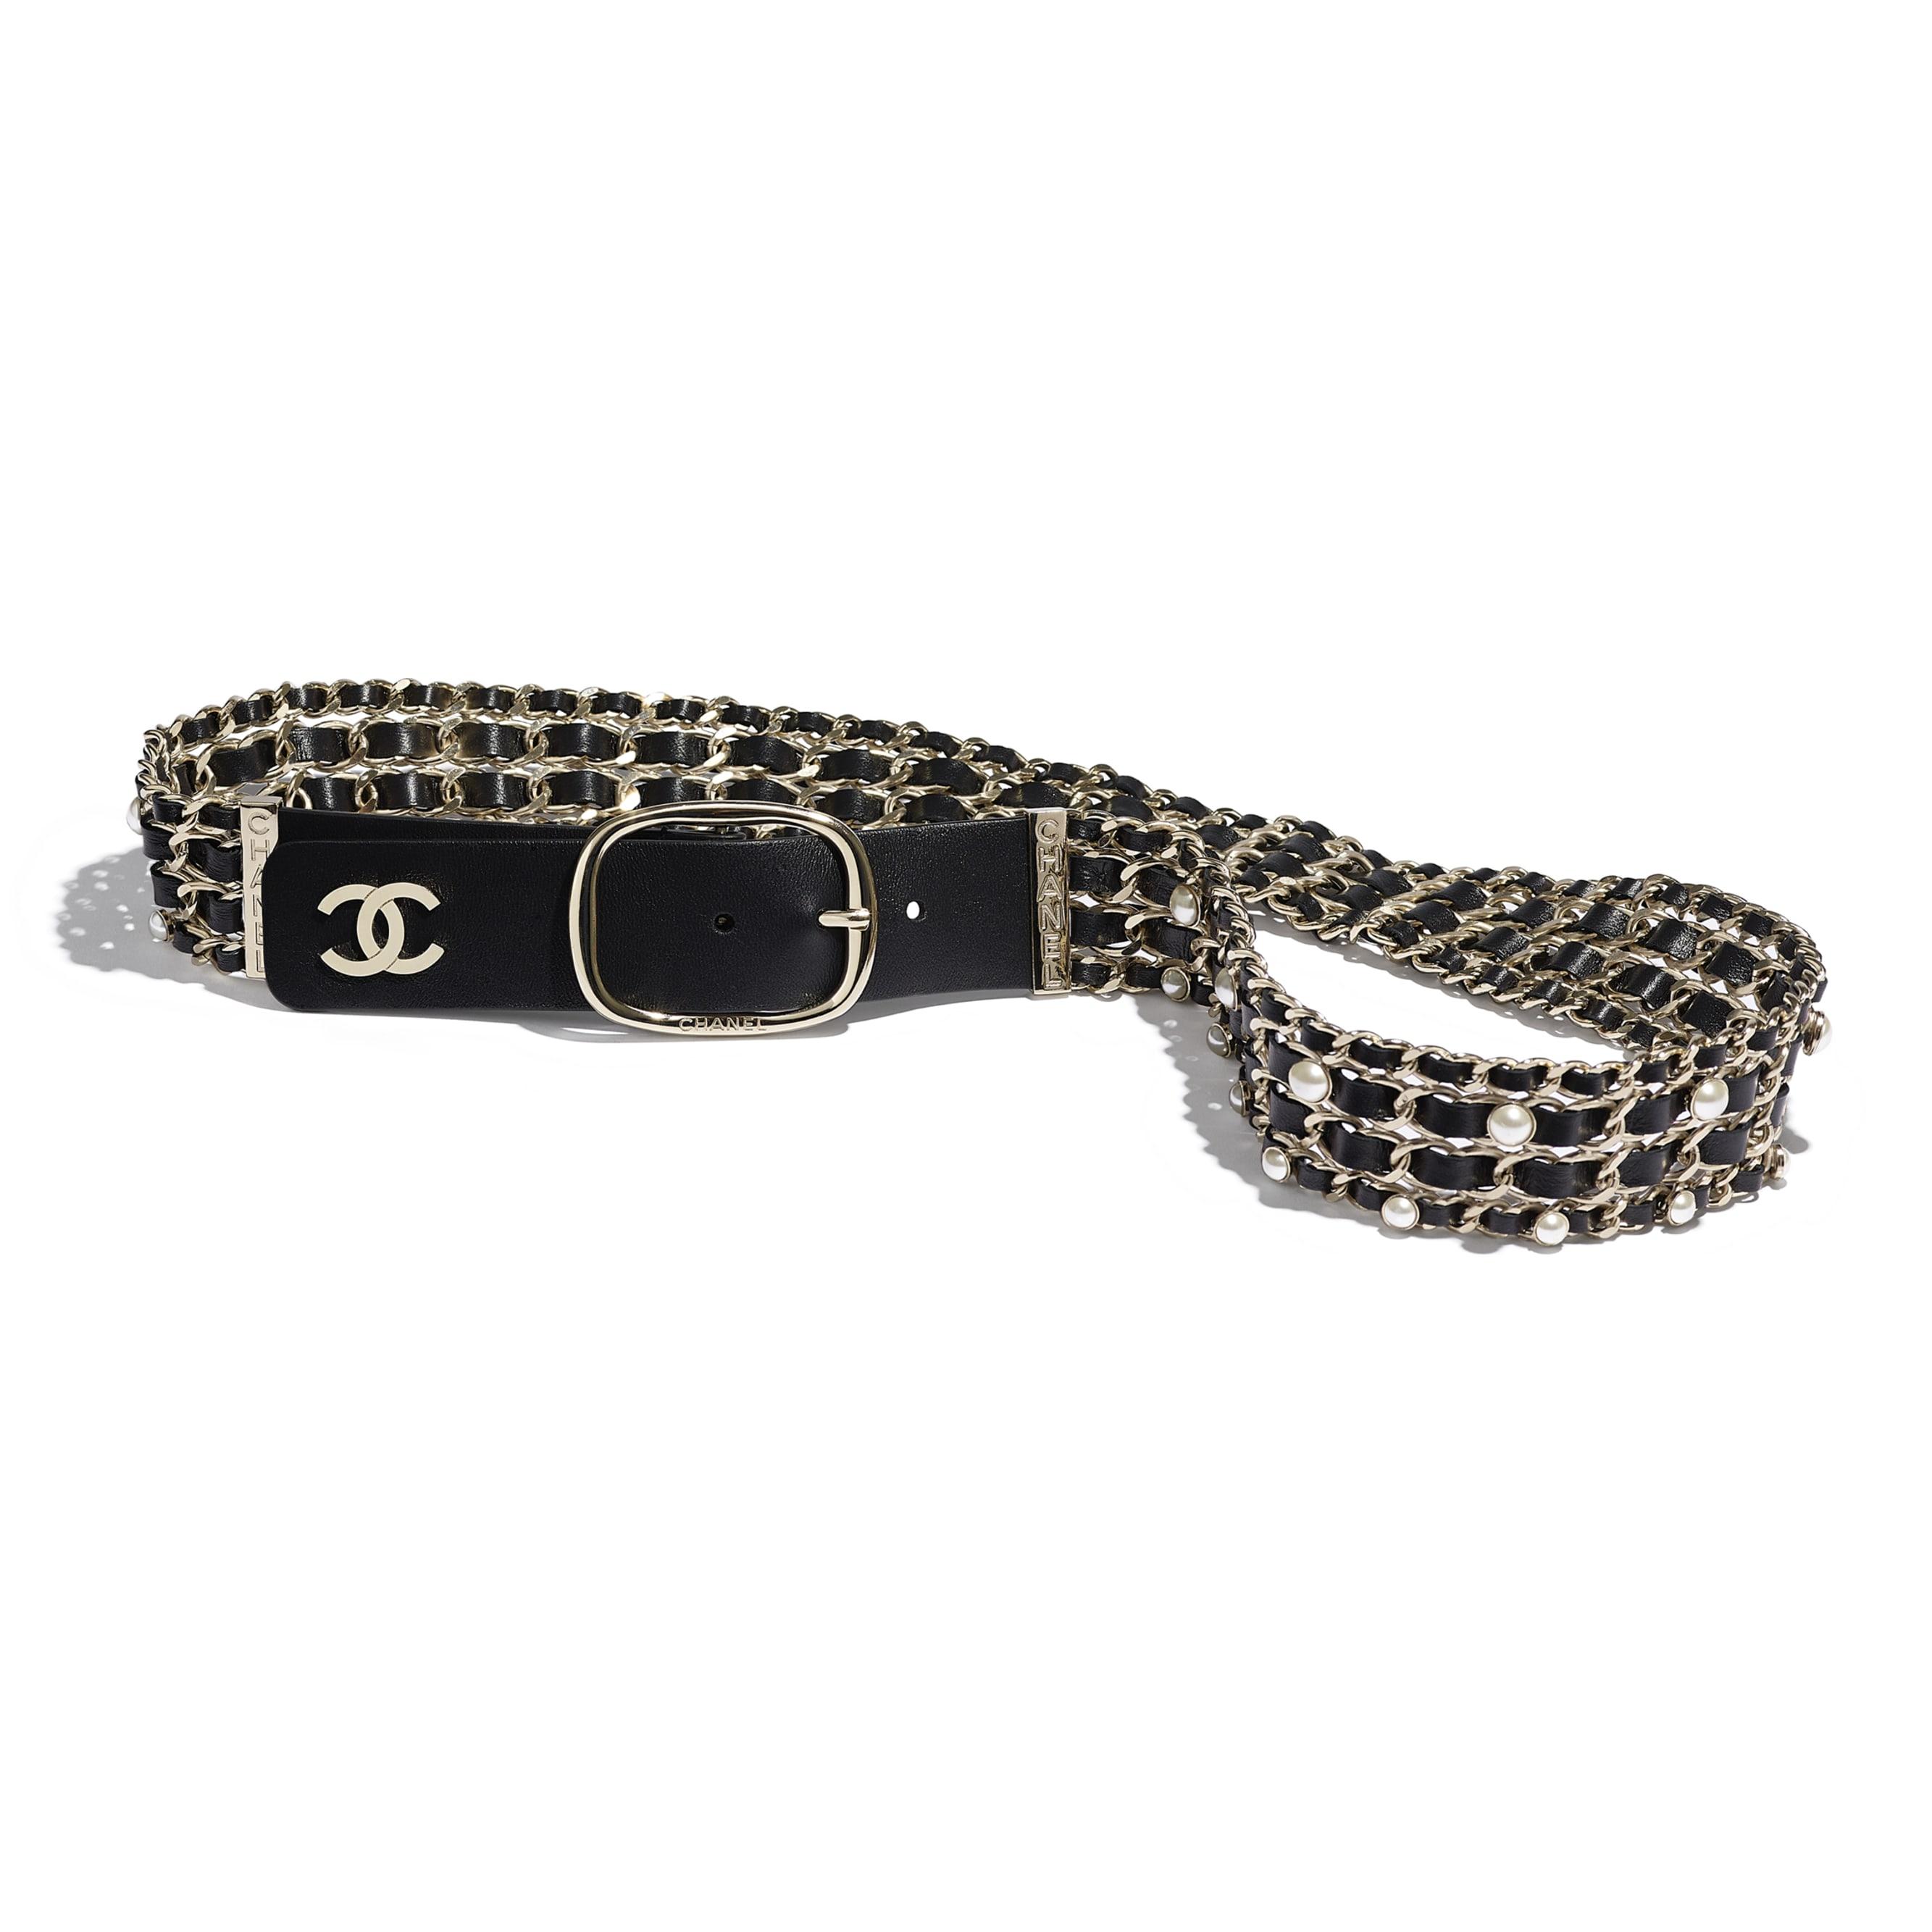 Belt - Black - Lambskin, Gold-Tone Metal & Glass Pearls - Default view - see standard sized version